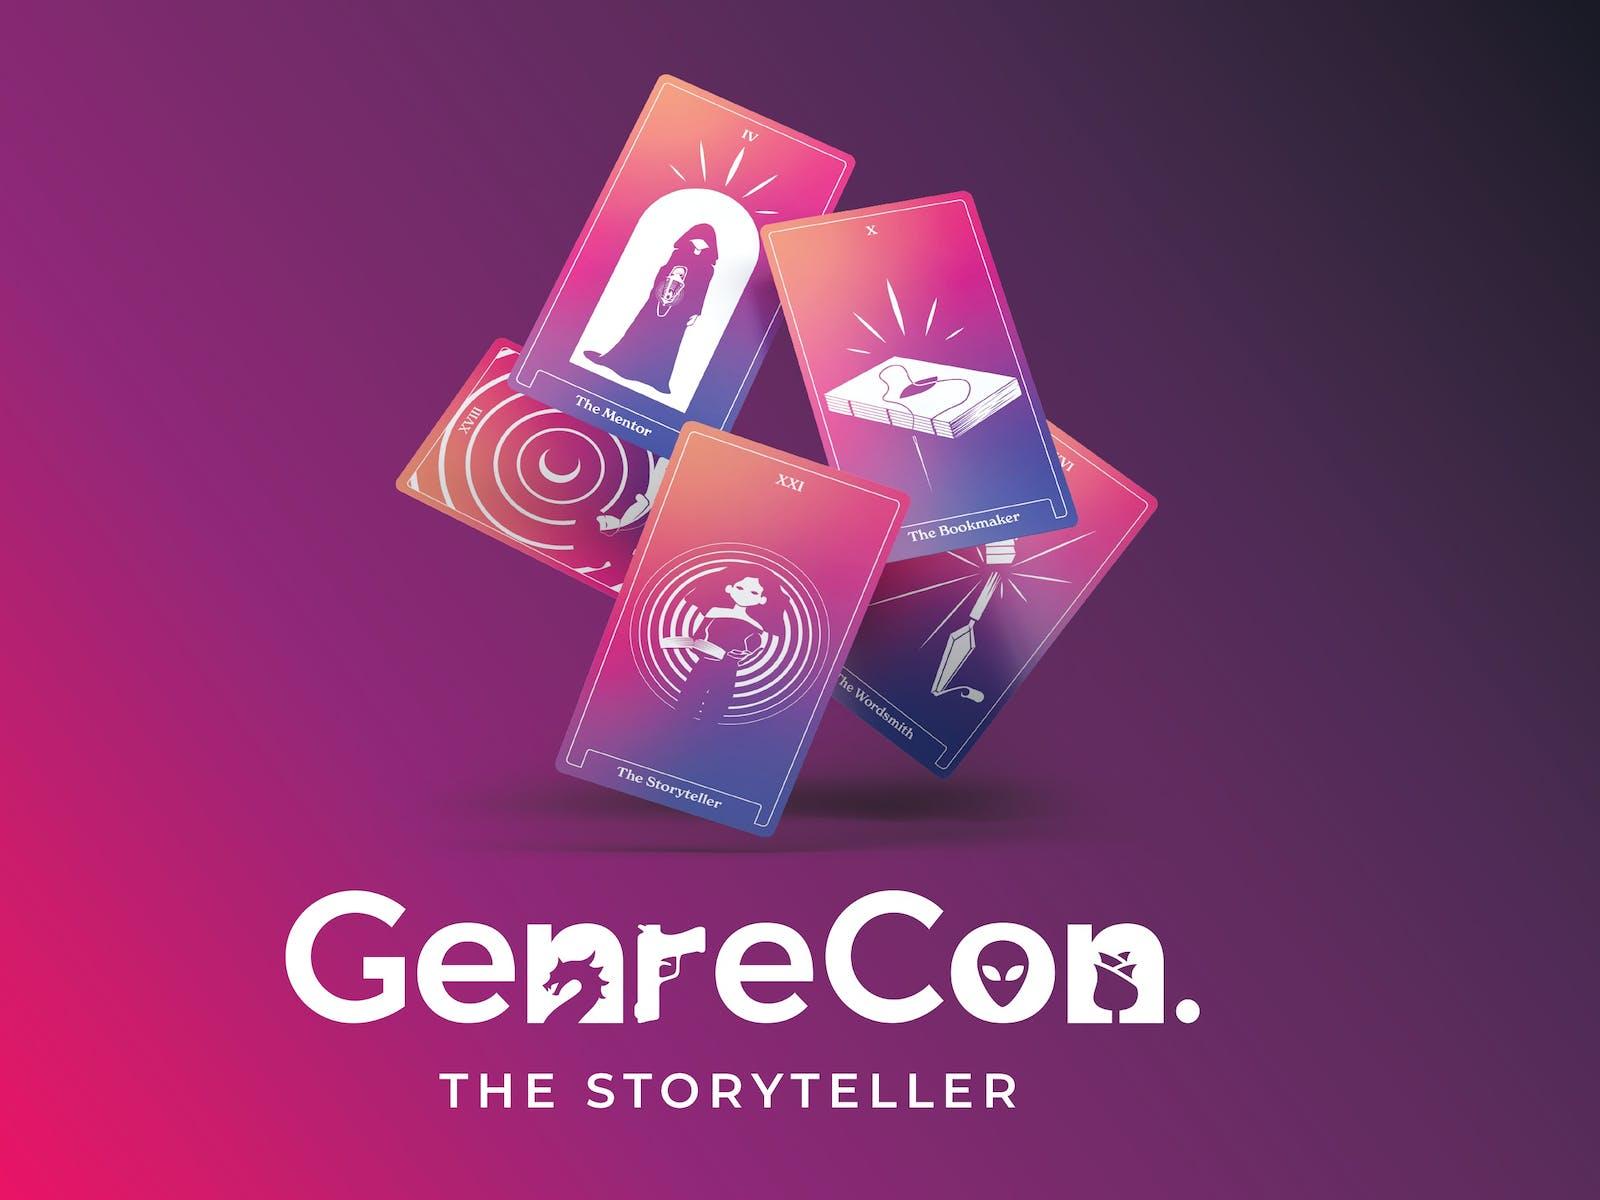 Image for GenreCon 2022: The Storyteller